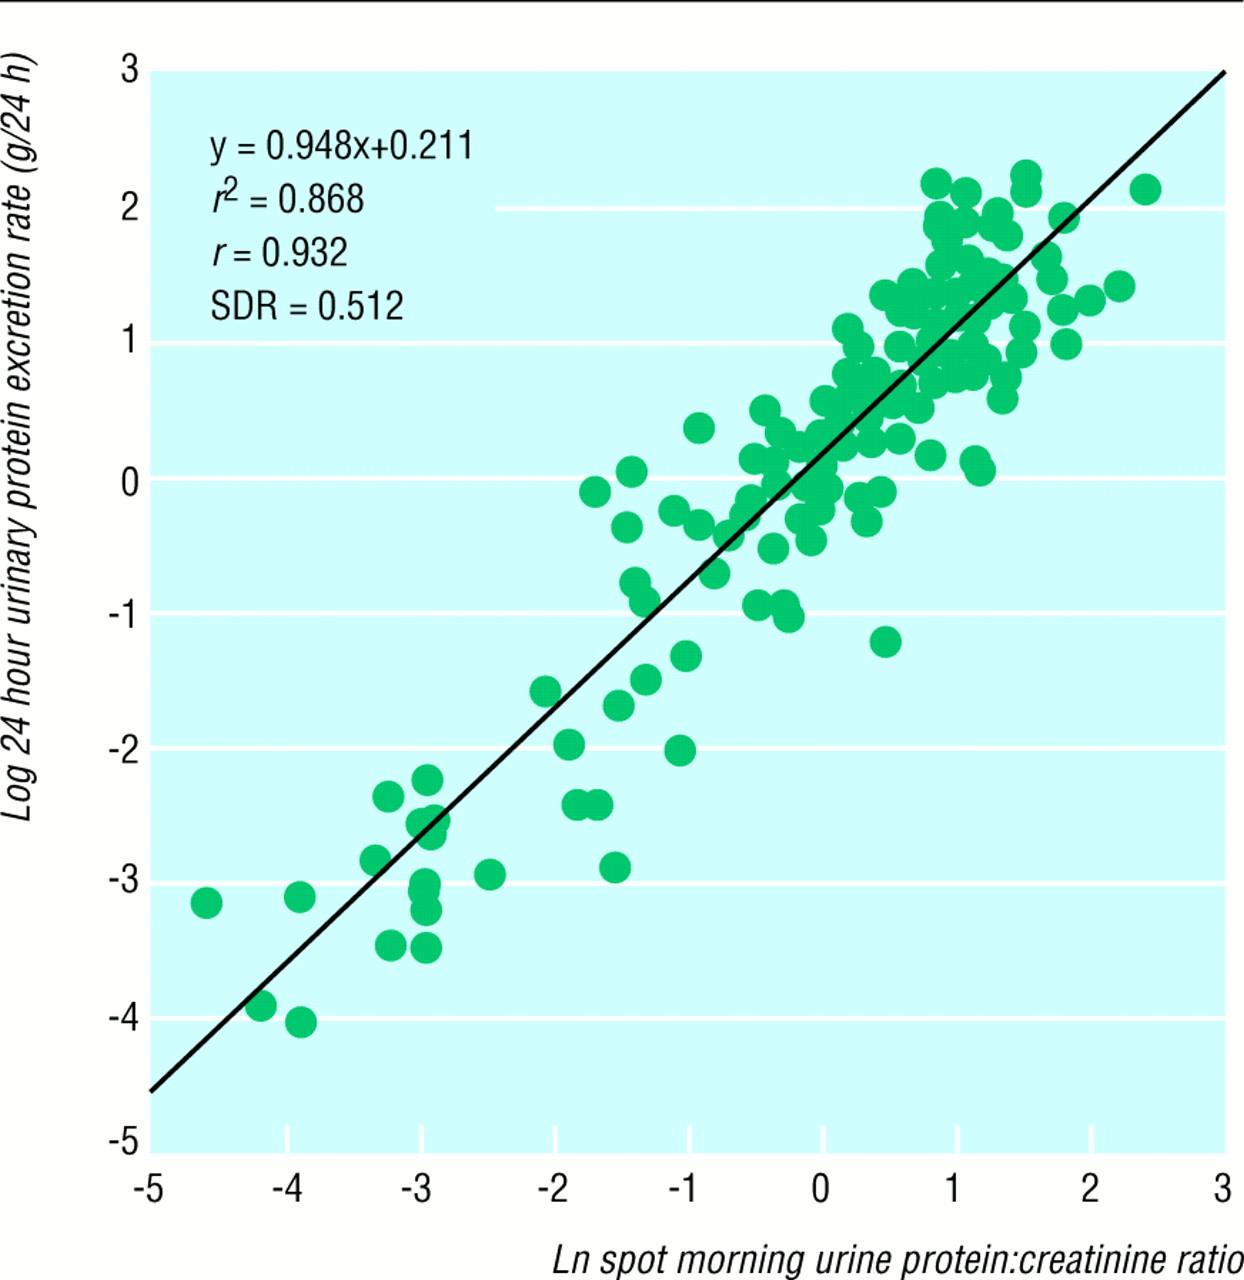 cross sectional longitudinal study of spot morning urine